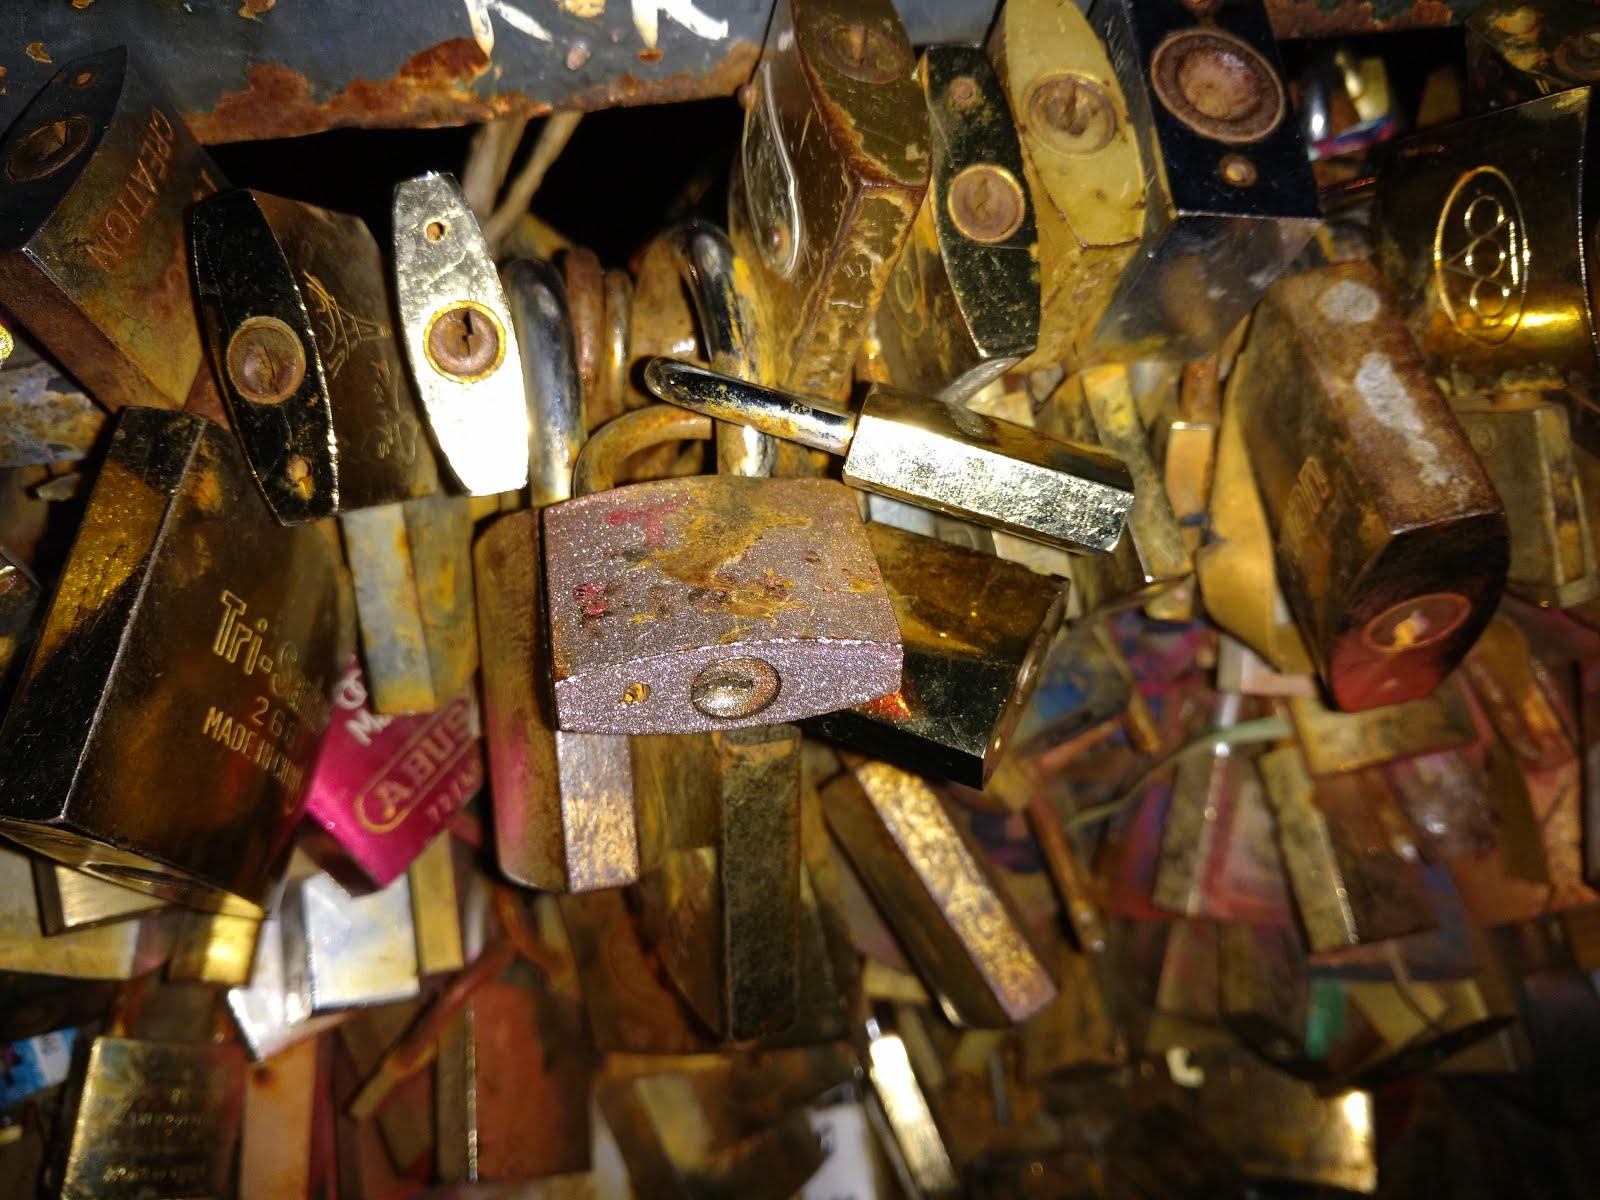 The infamous locks of Paris